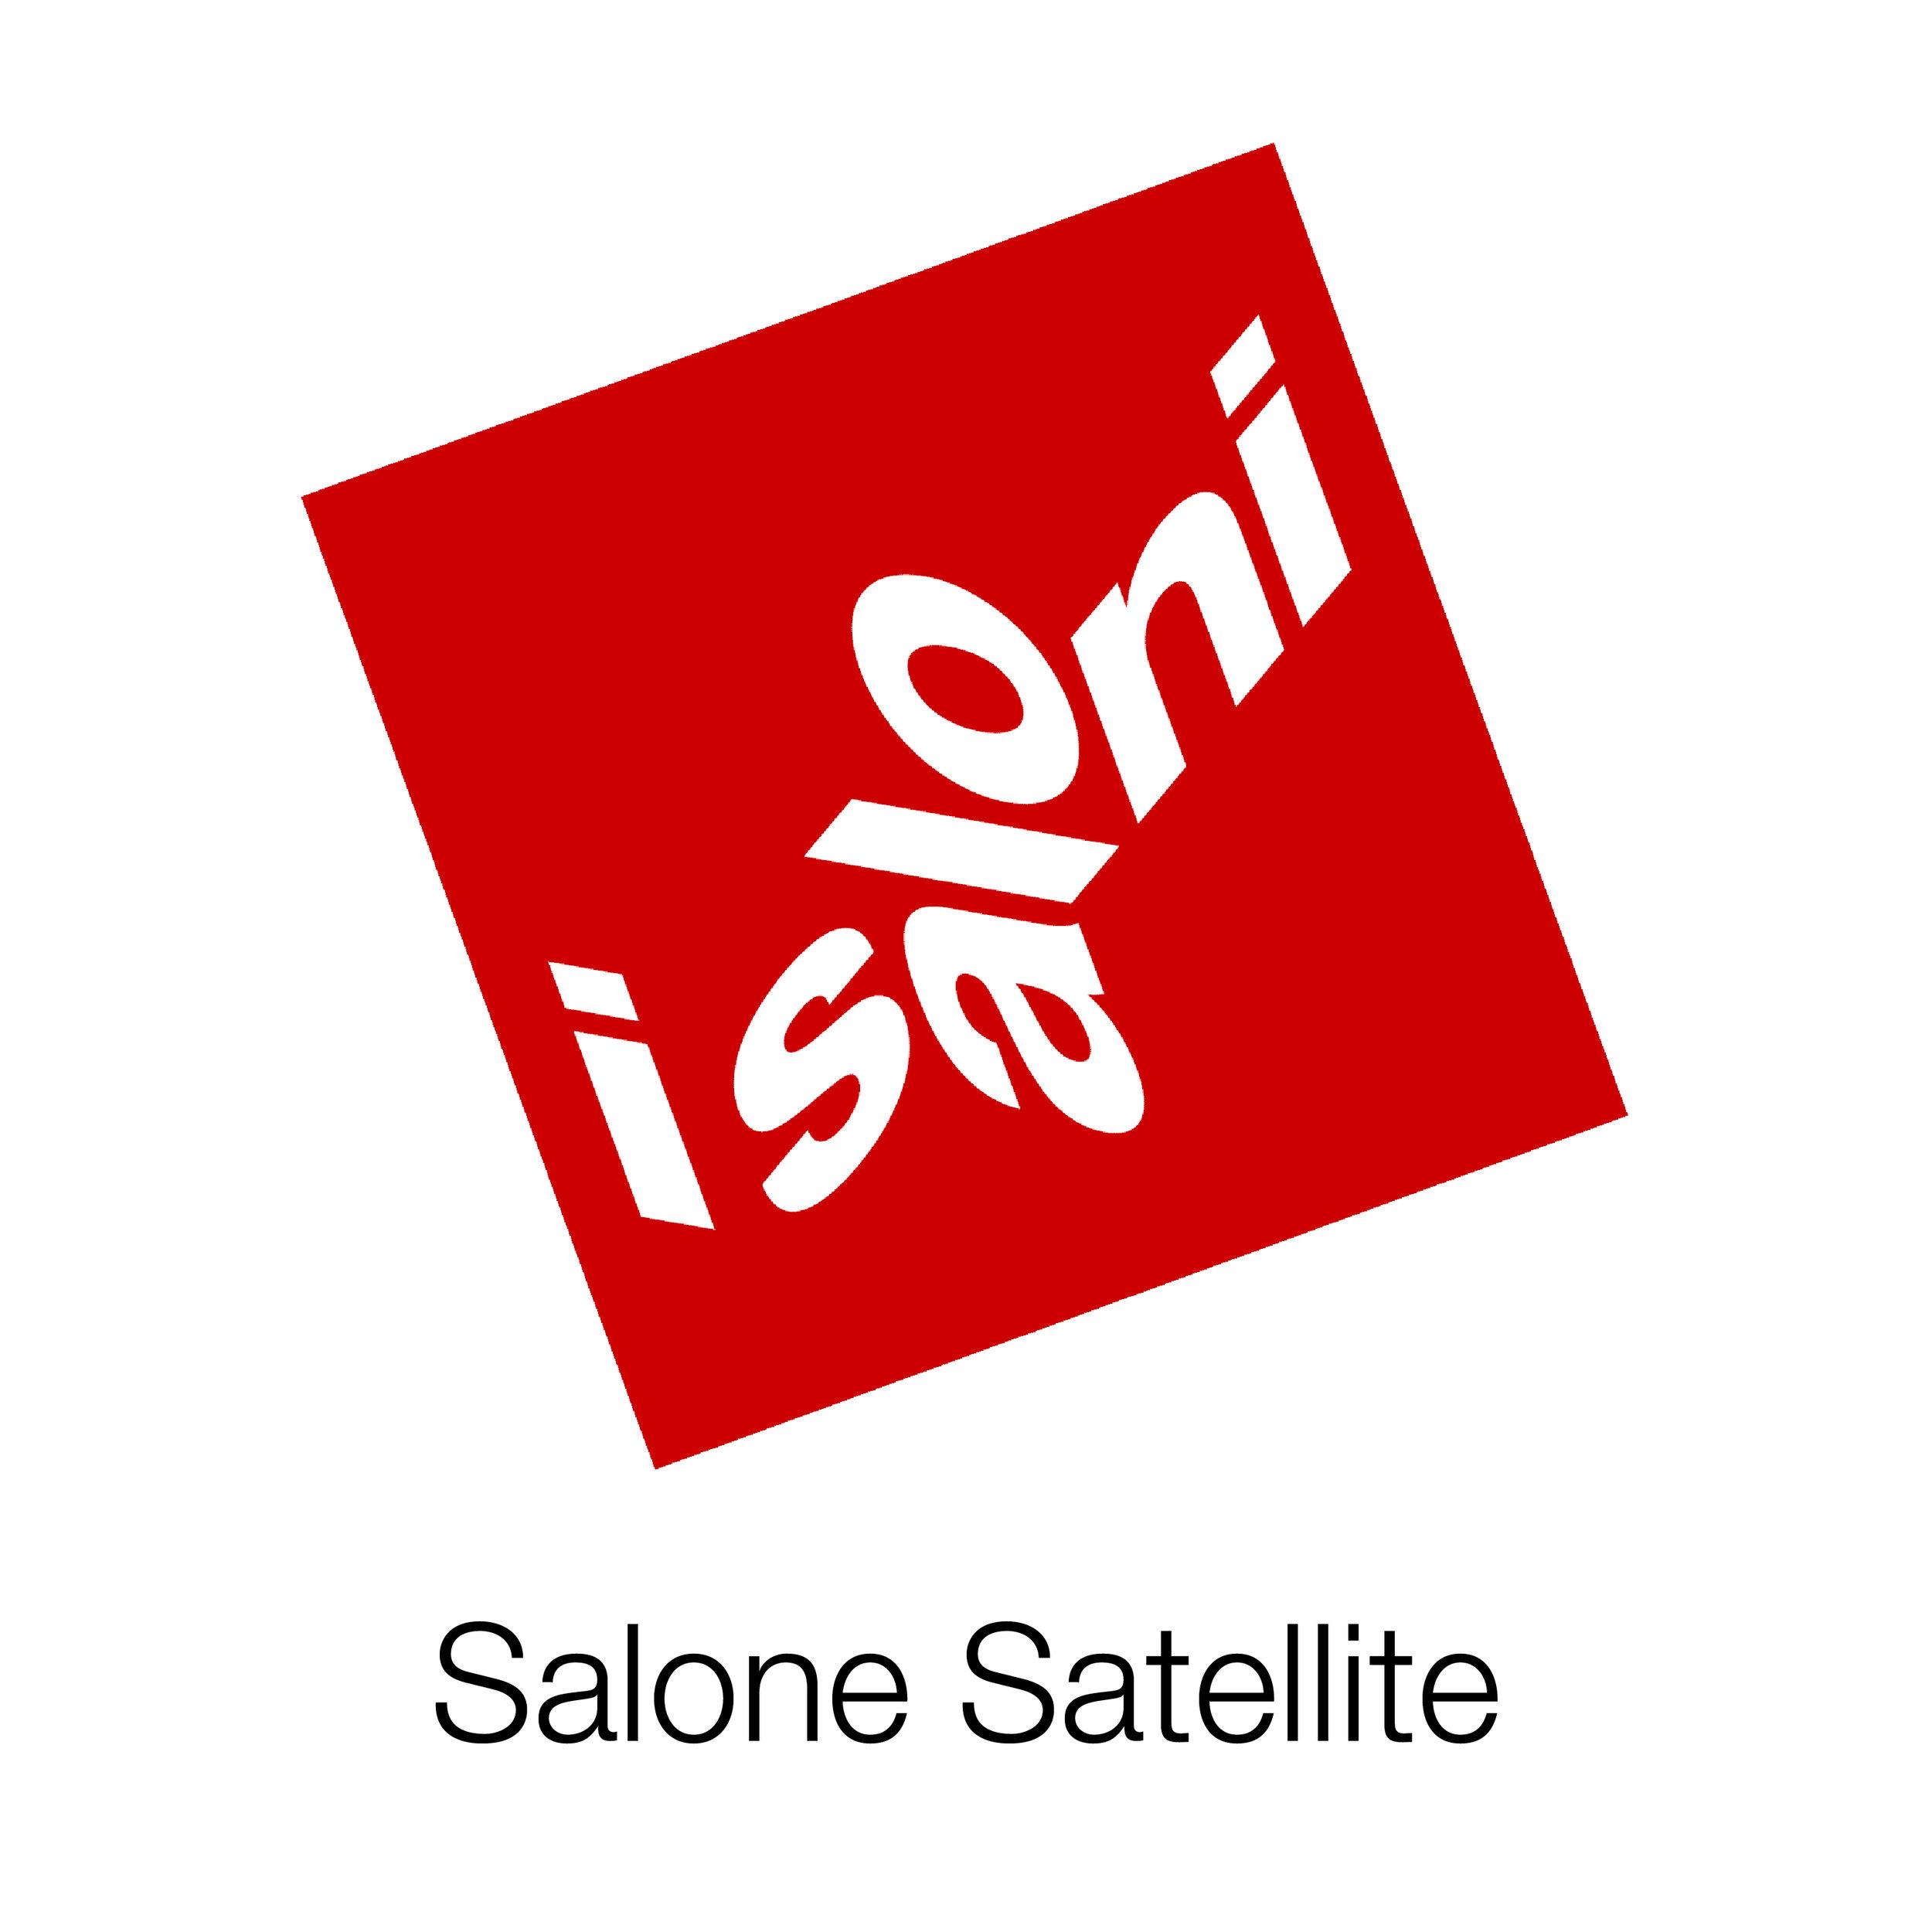 Salone Satellite S.jpg